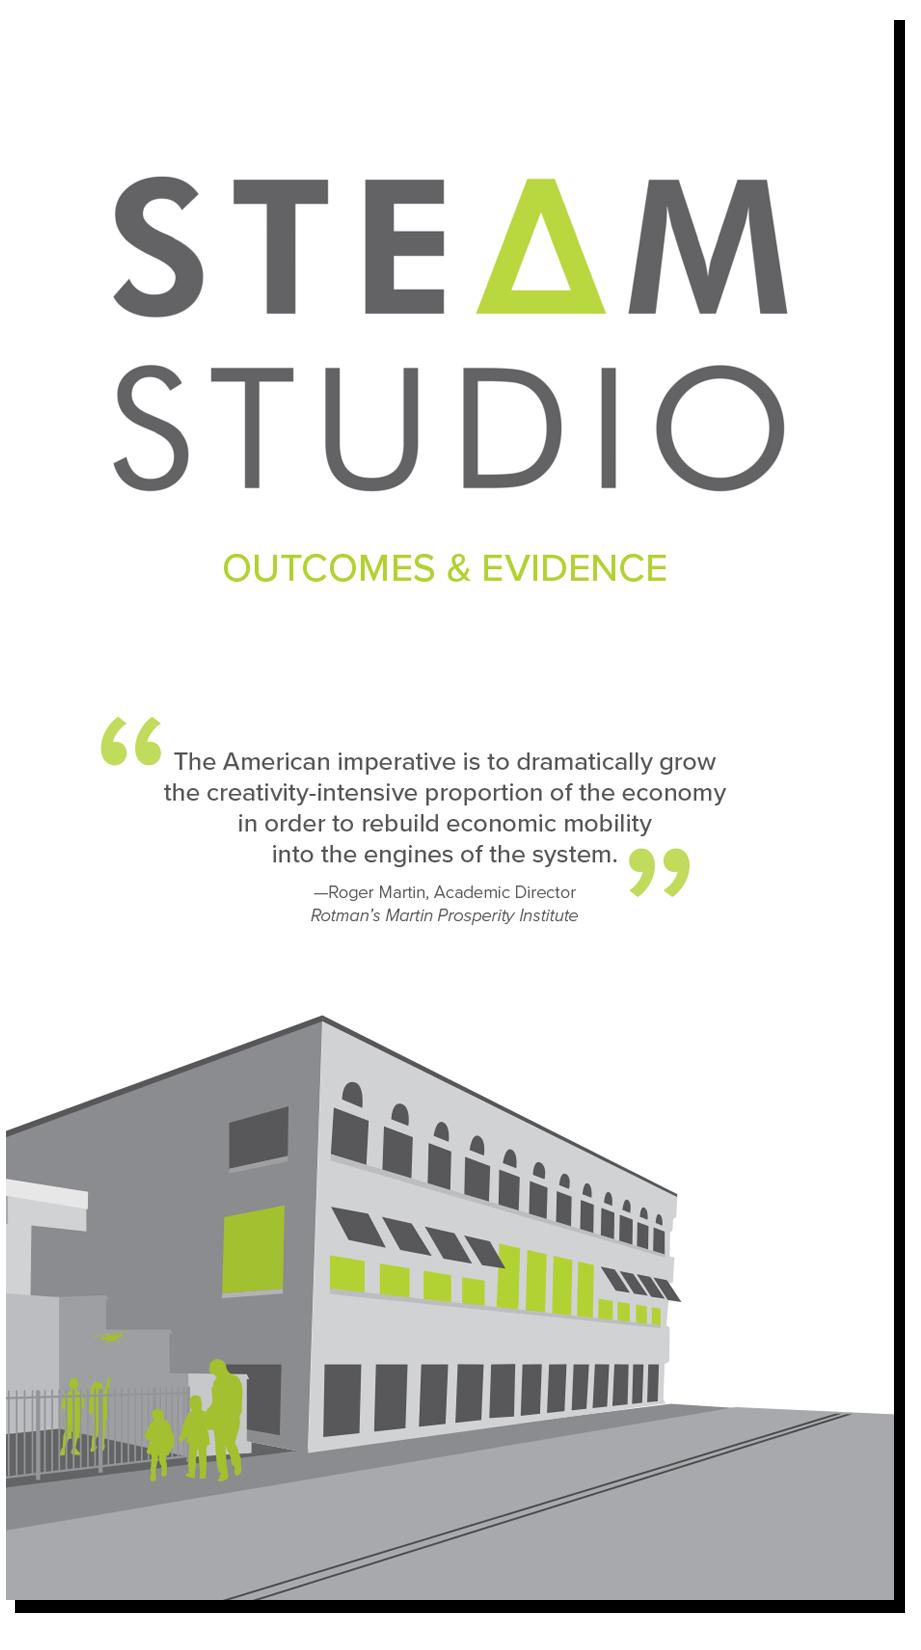 STEAM Studio Outcomes & Evidence